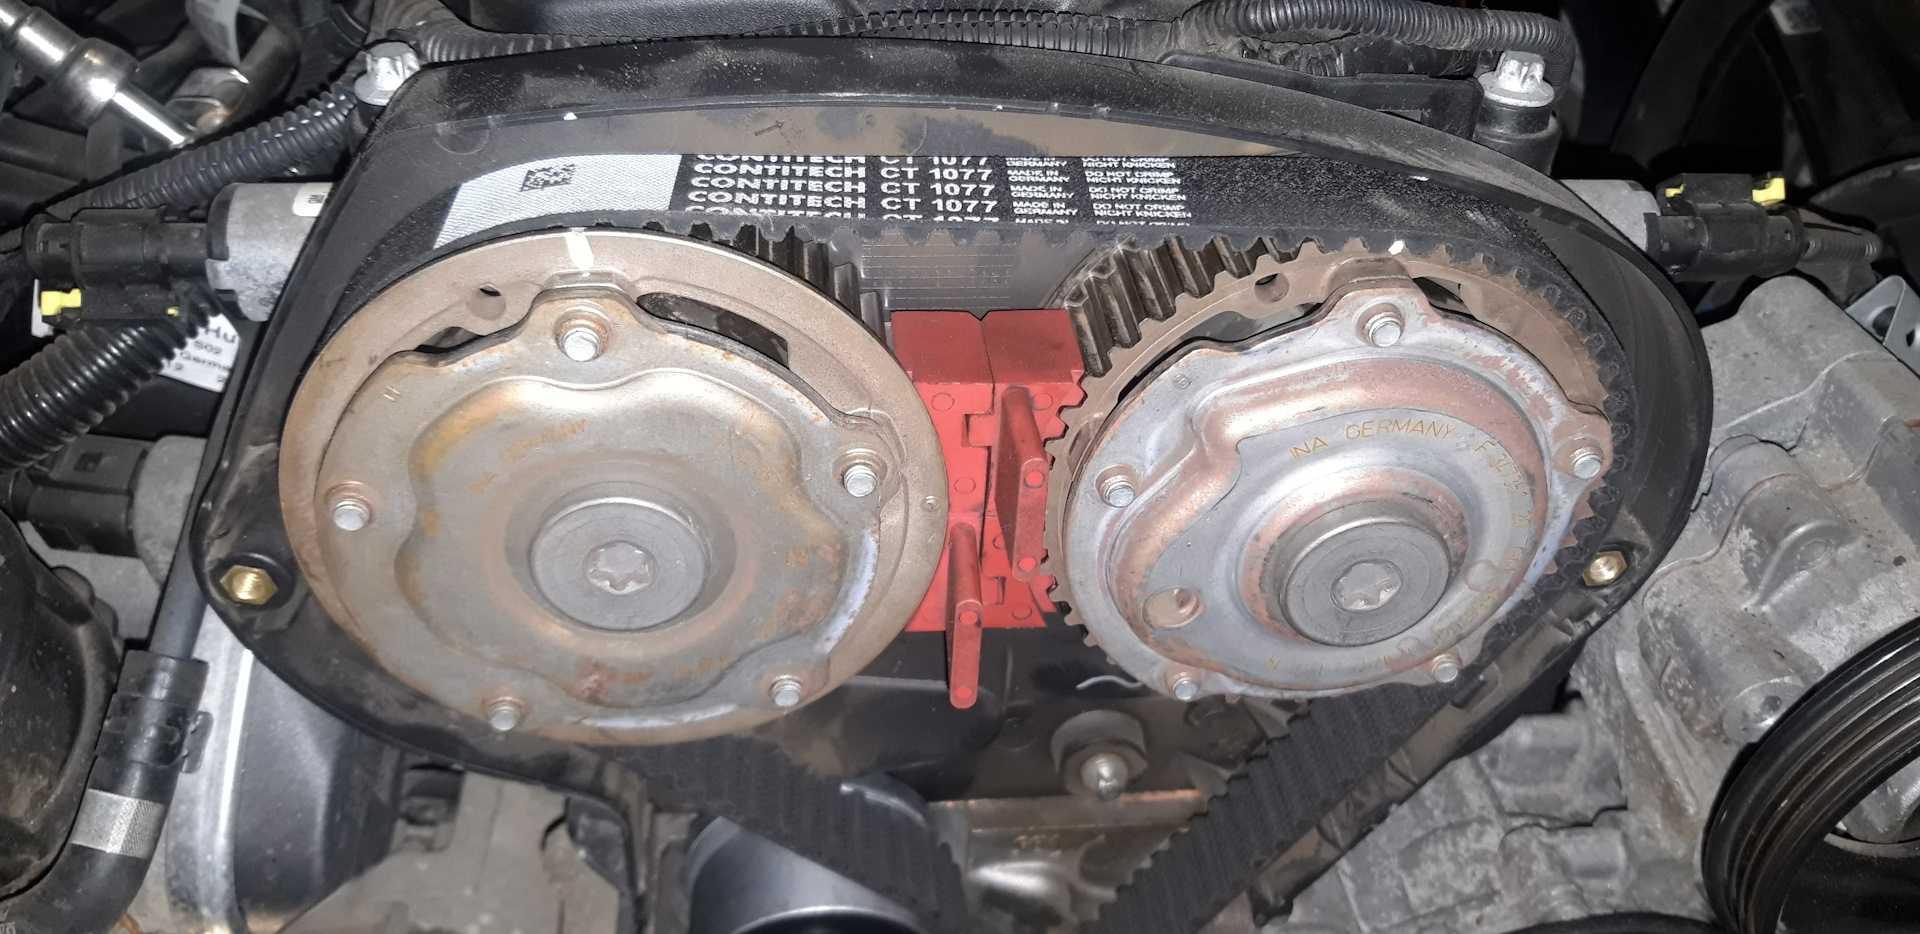 Замена грм chevrolet cruze 1.6 автодок24 - все про ремонт автомобиля